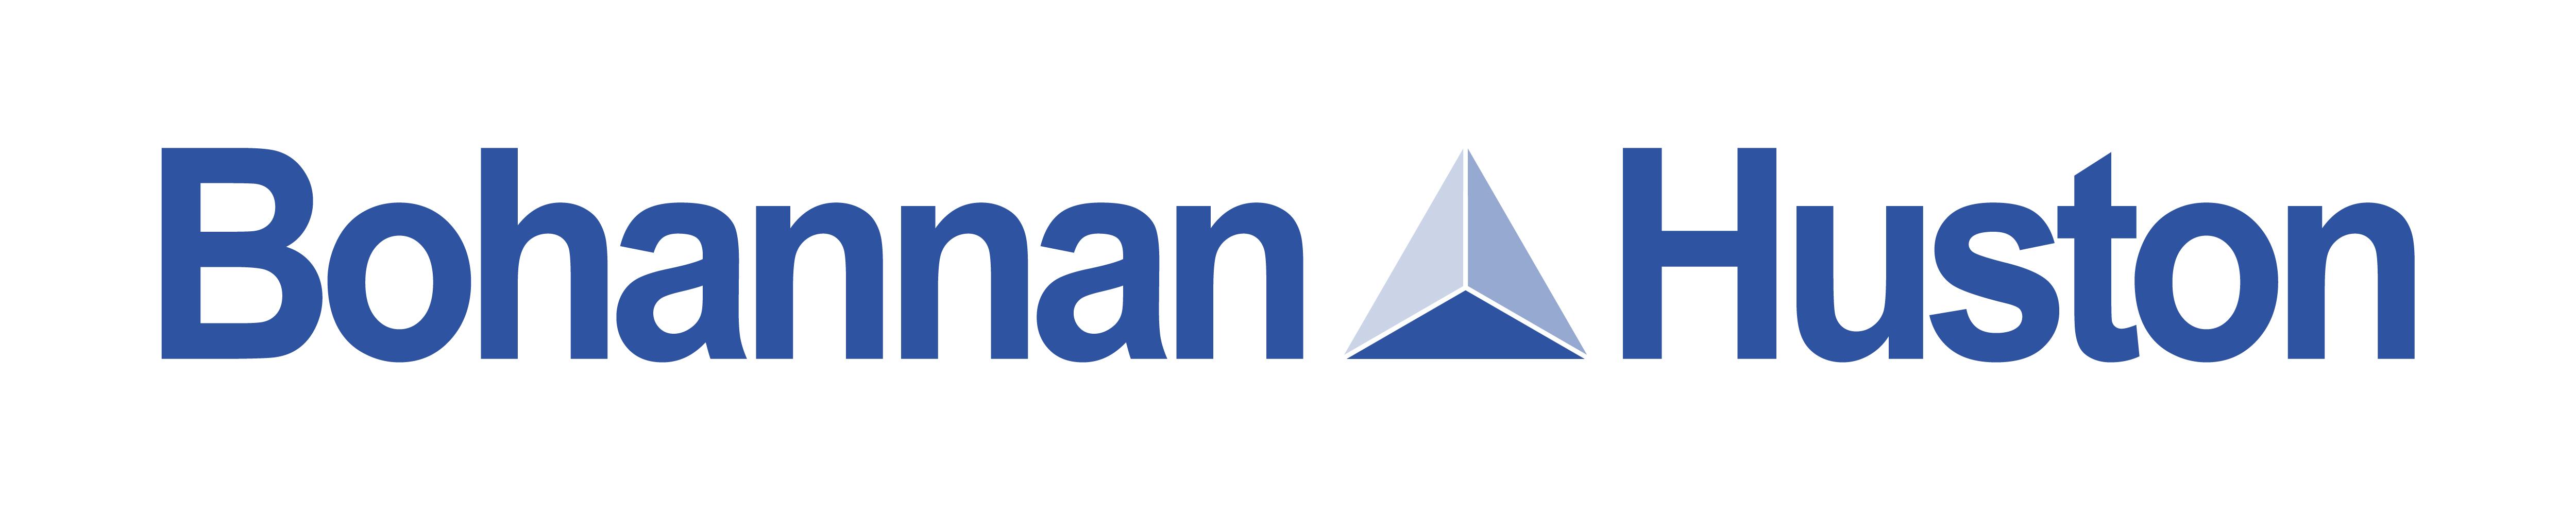 Bohannan-Huston Company Logo